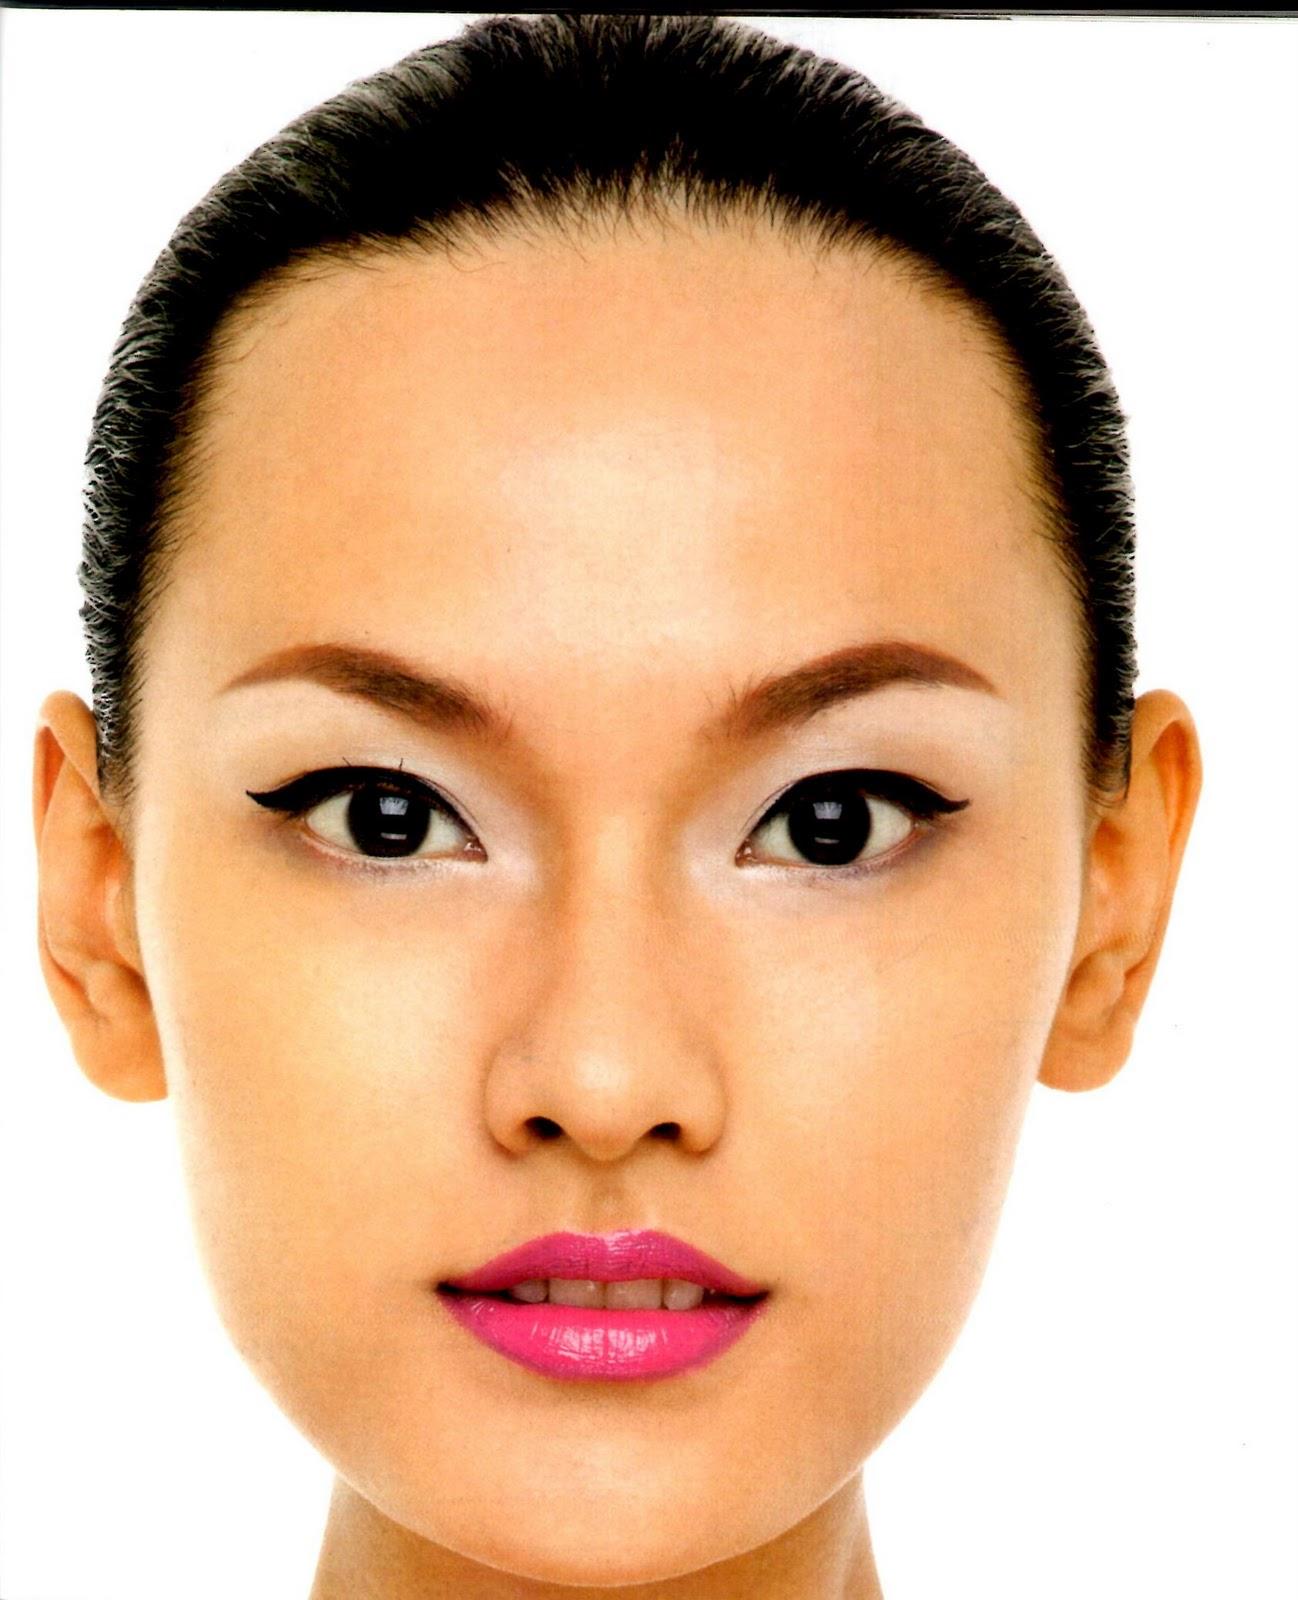 ... Tips : Cara merias wajah yang sempurna sesuai dengan bentuk muka kita